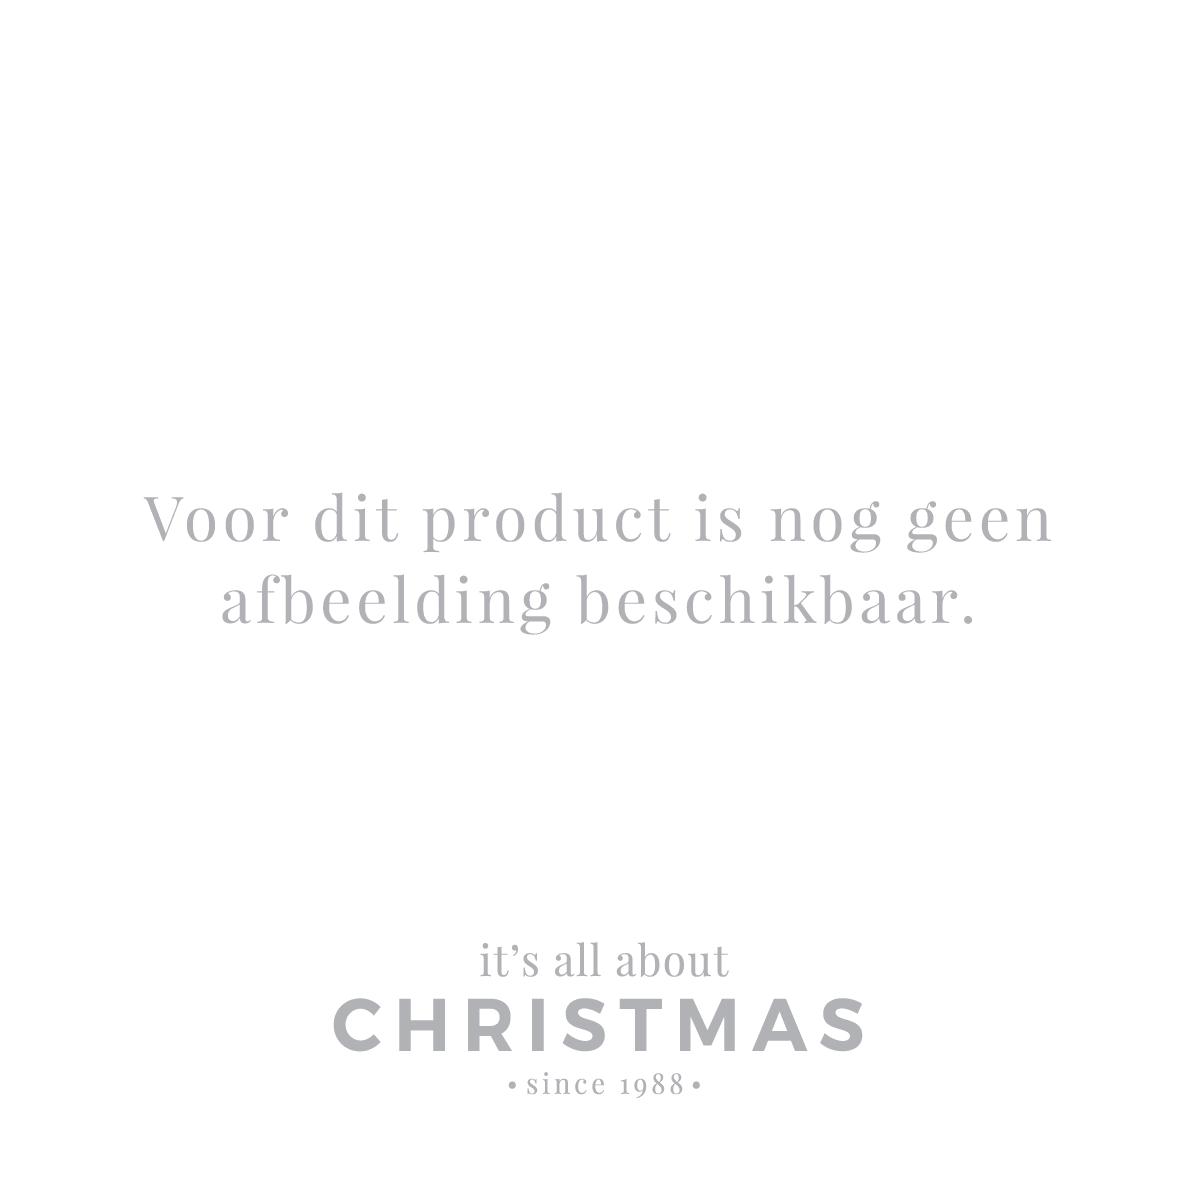 Schneeflocke Christbaumschmuck Anh/änger aus naturbelassenem Holz mit Jute Schnur als Weihnachtsschmuck,Christbaumschmuck,Holz Basteln 20 St/ücke Schneeflocken aus Holz 4 Designs 5 Stk//Design